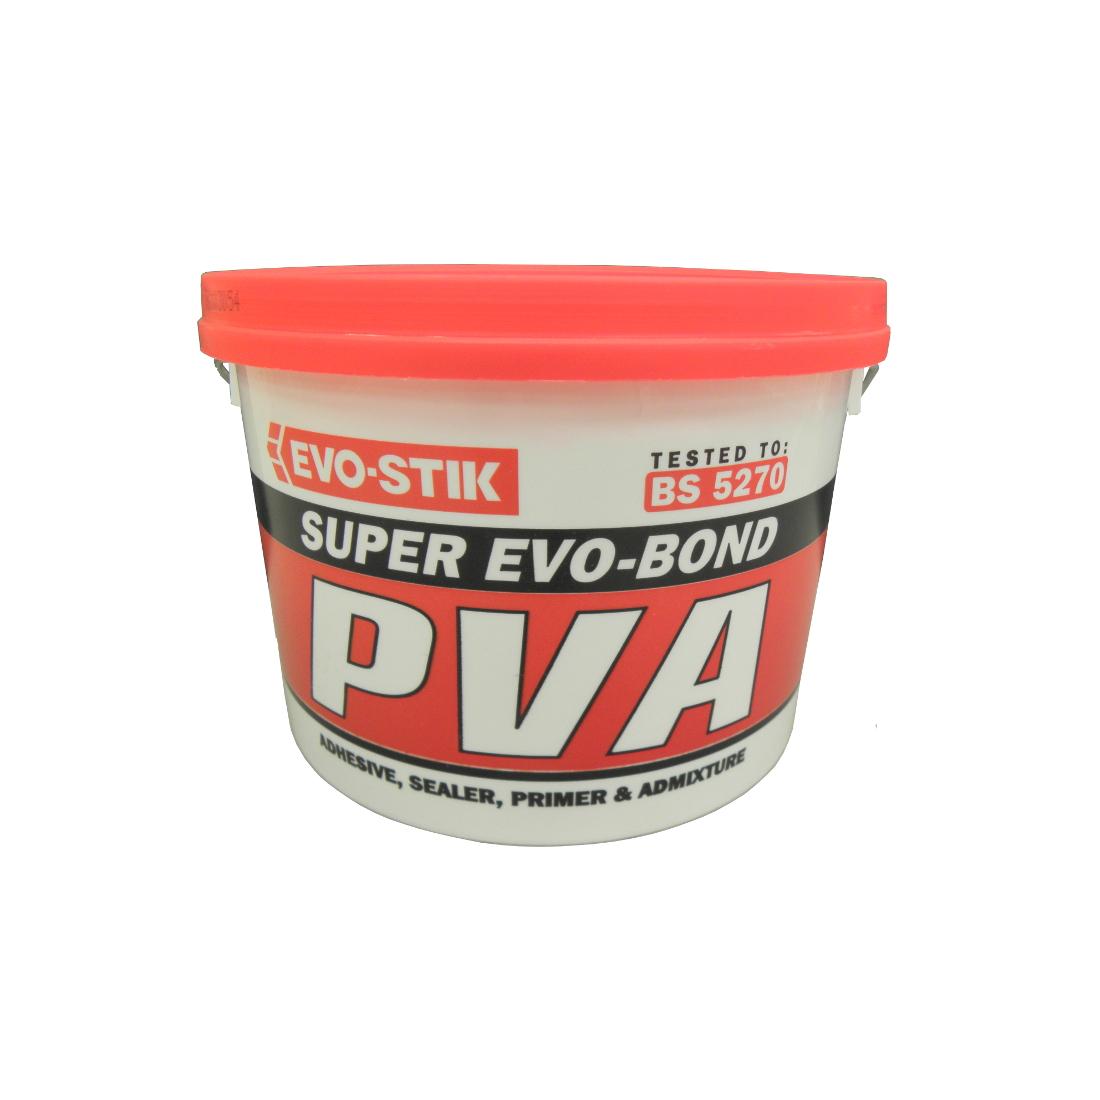 Evo-Bond PVA Adhesive